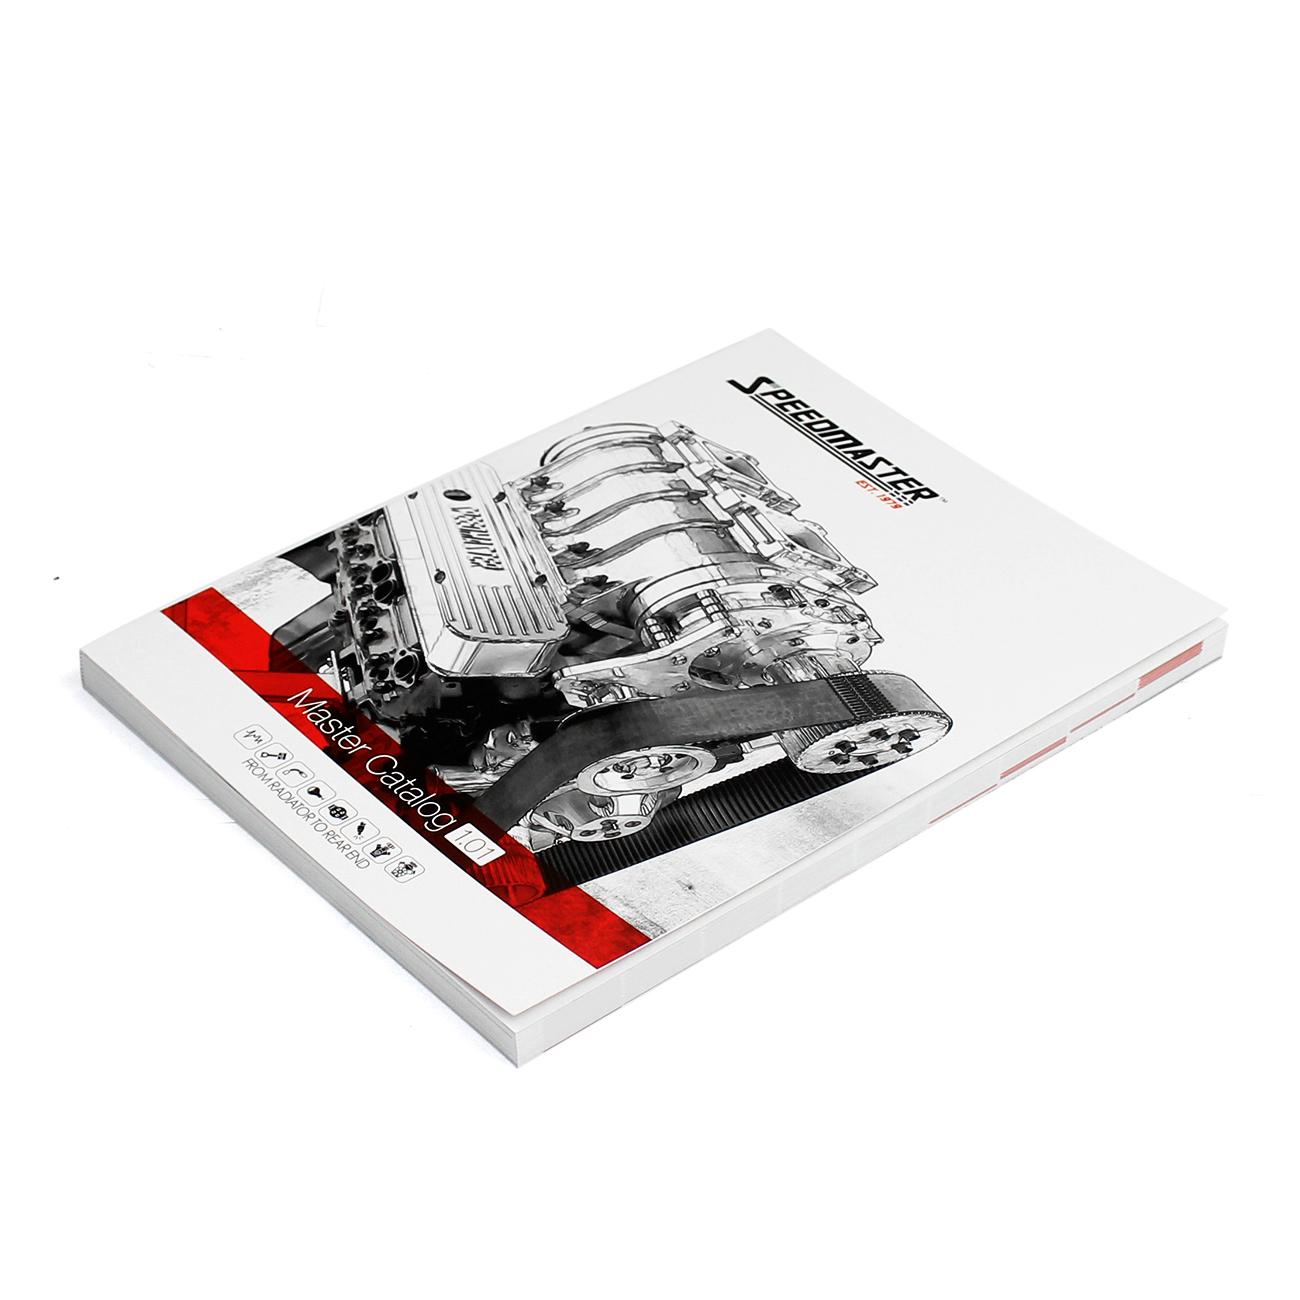 Speedmaster Master Catalog Version 1.01 [320 Pages]